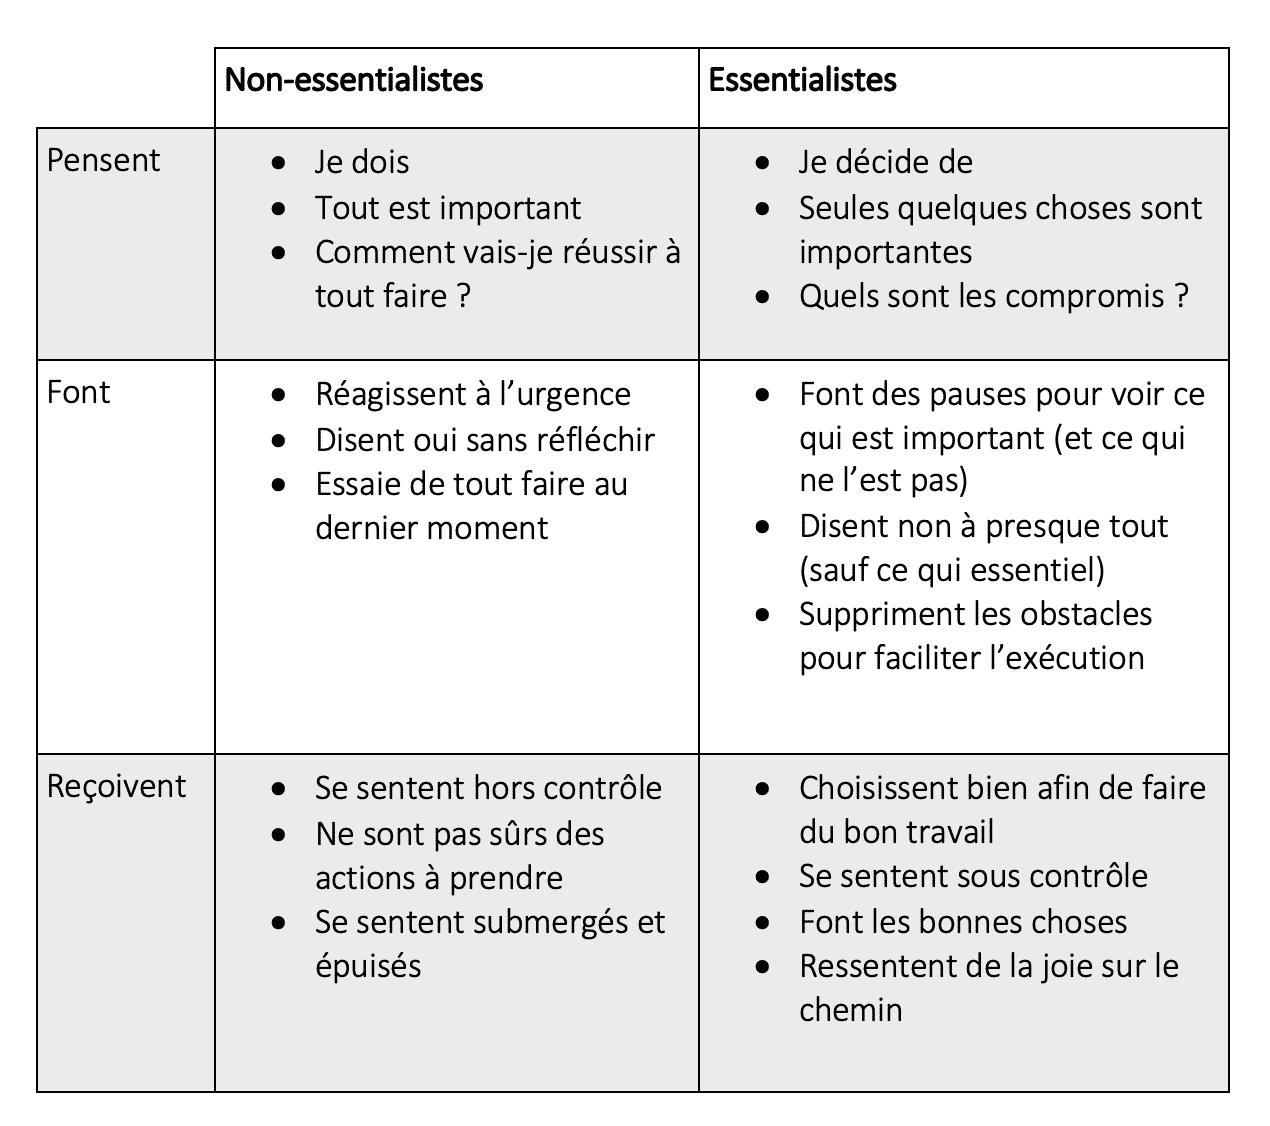 non-essentialistes vs essentialistes